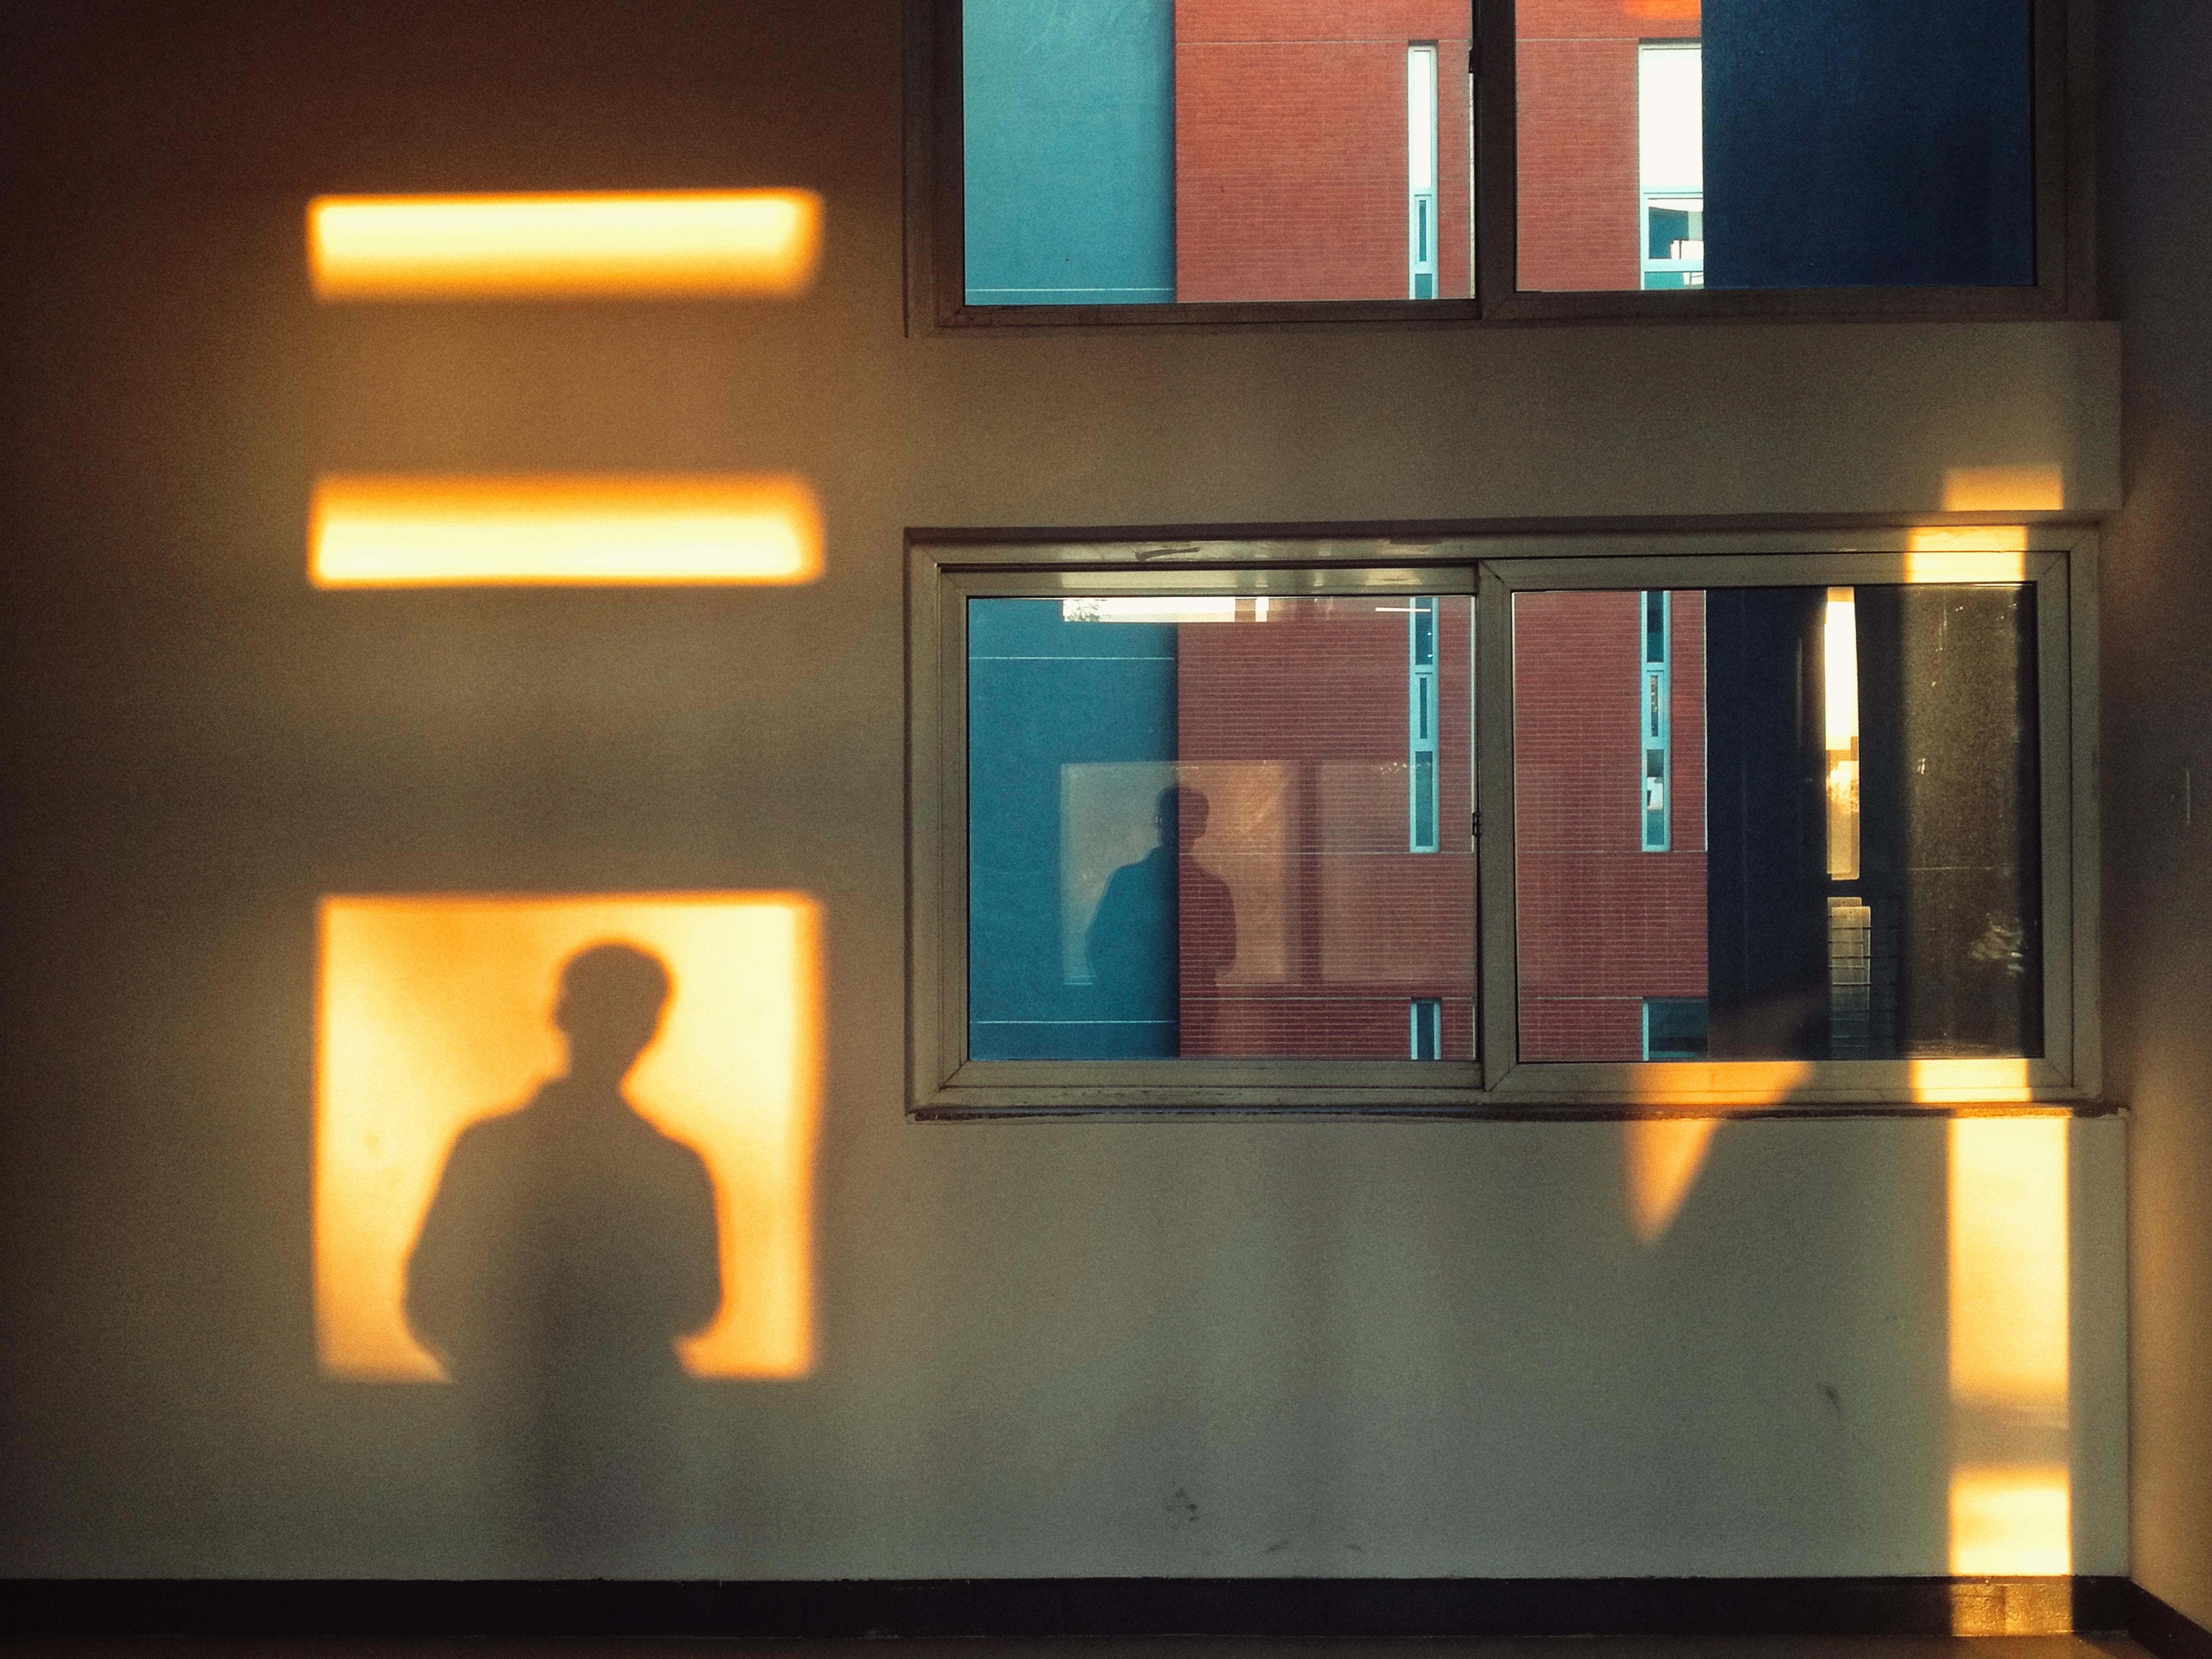 shadow of person near window